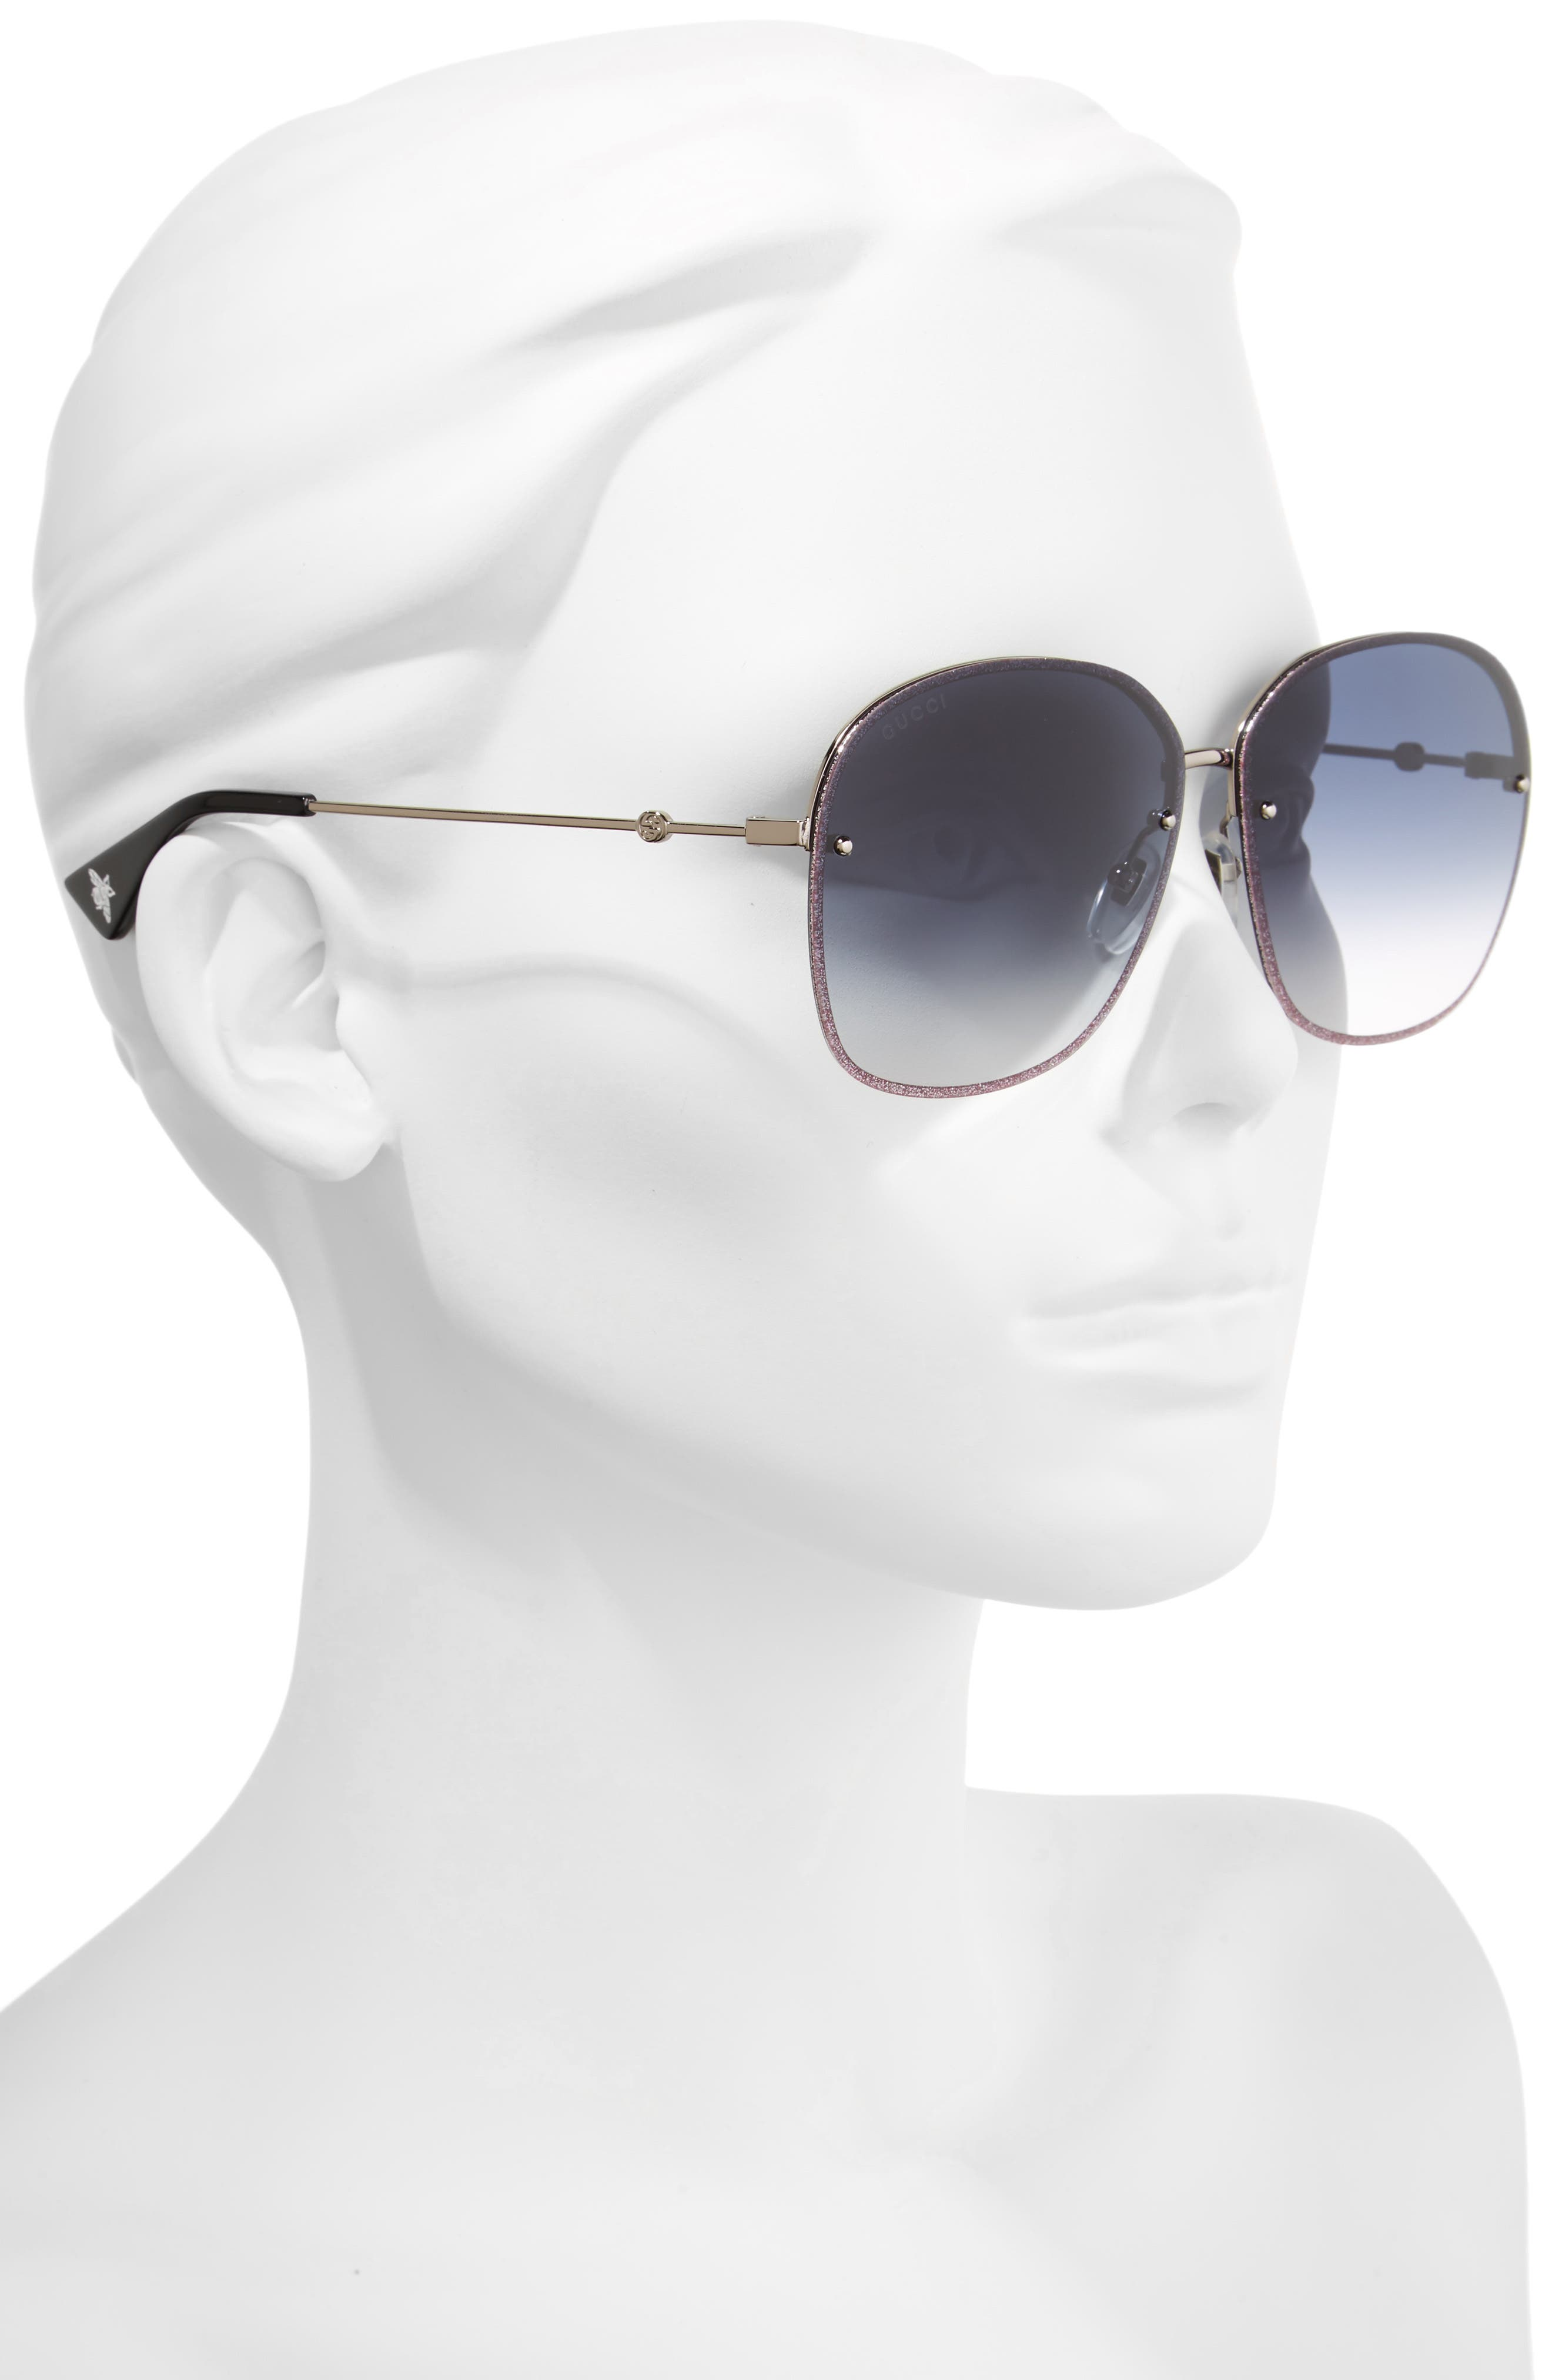 GUCCI,                             63mm Oversize Square Sunglasses,                             Alternate thumbnail 2, color,                             040